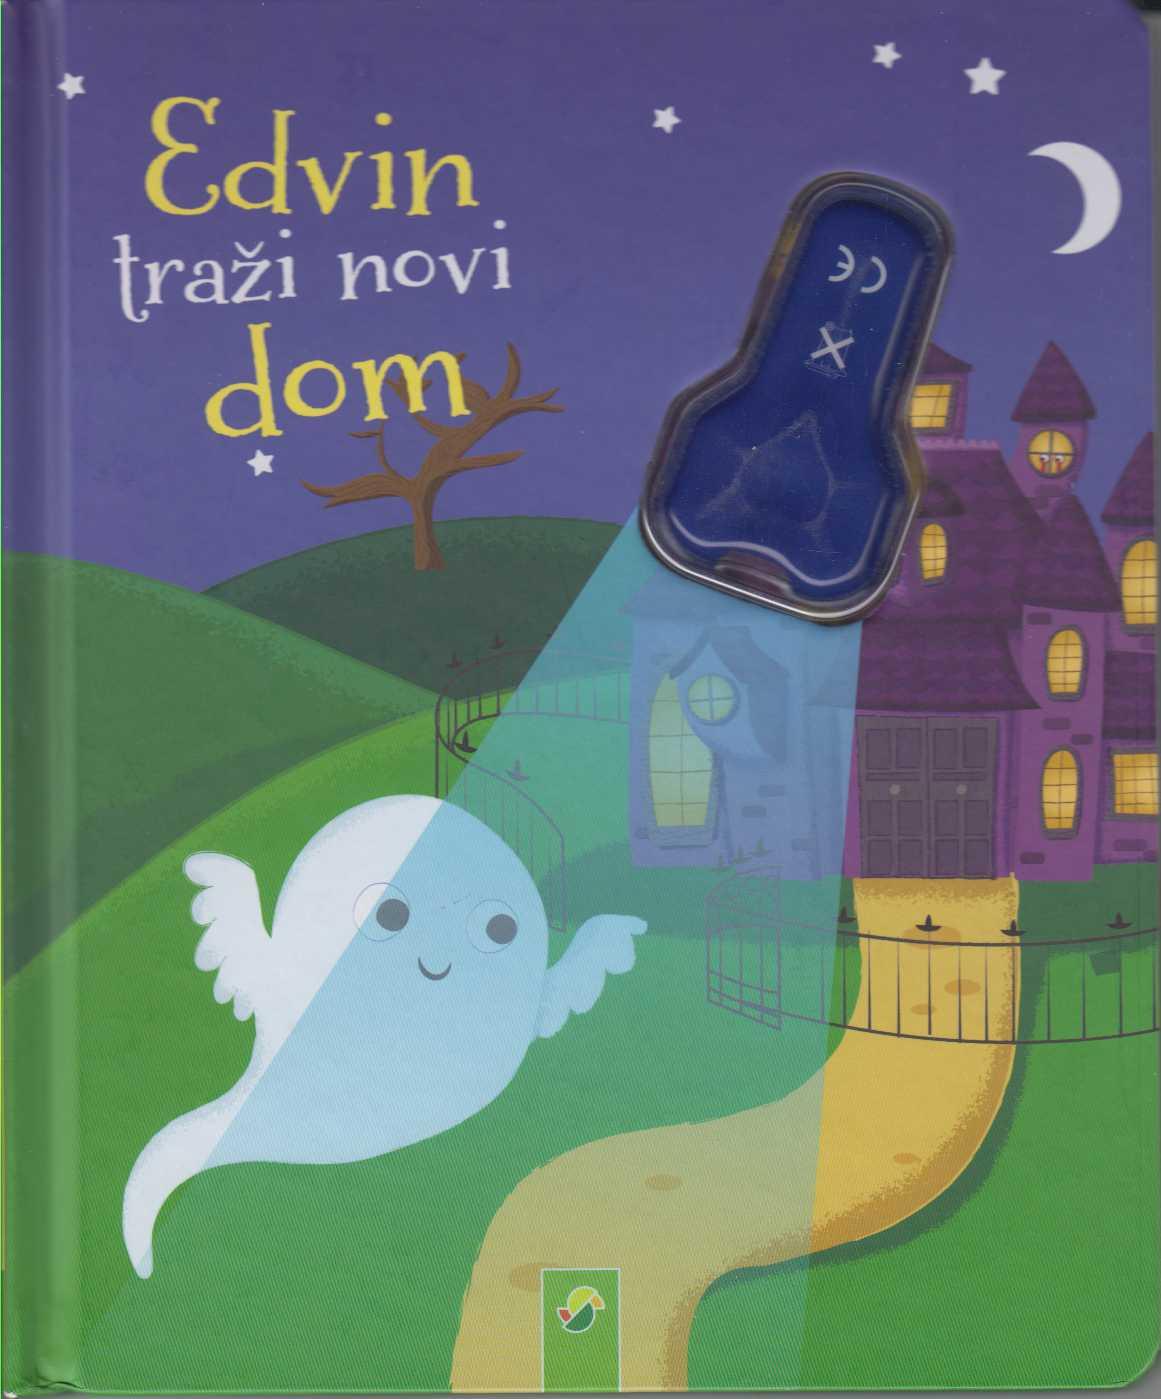 Edvin traži novi dom